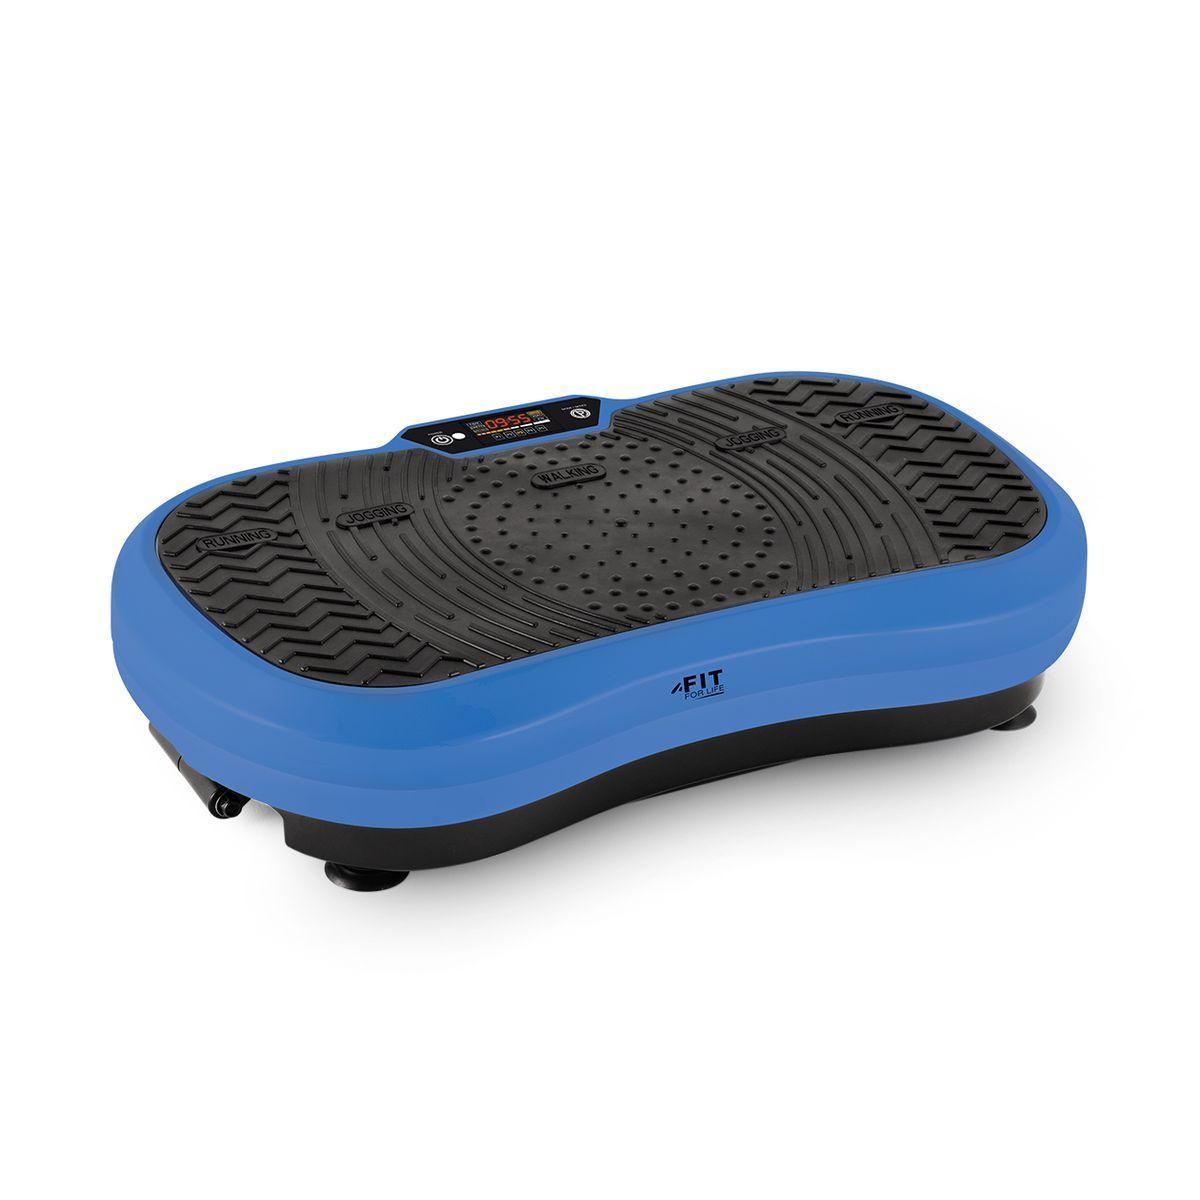 Machine de vibration VIB900 - Bleu